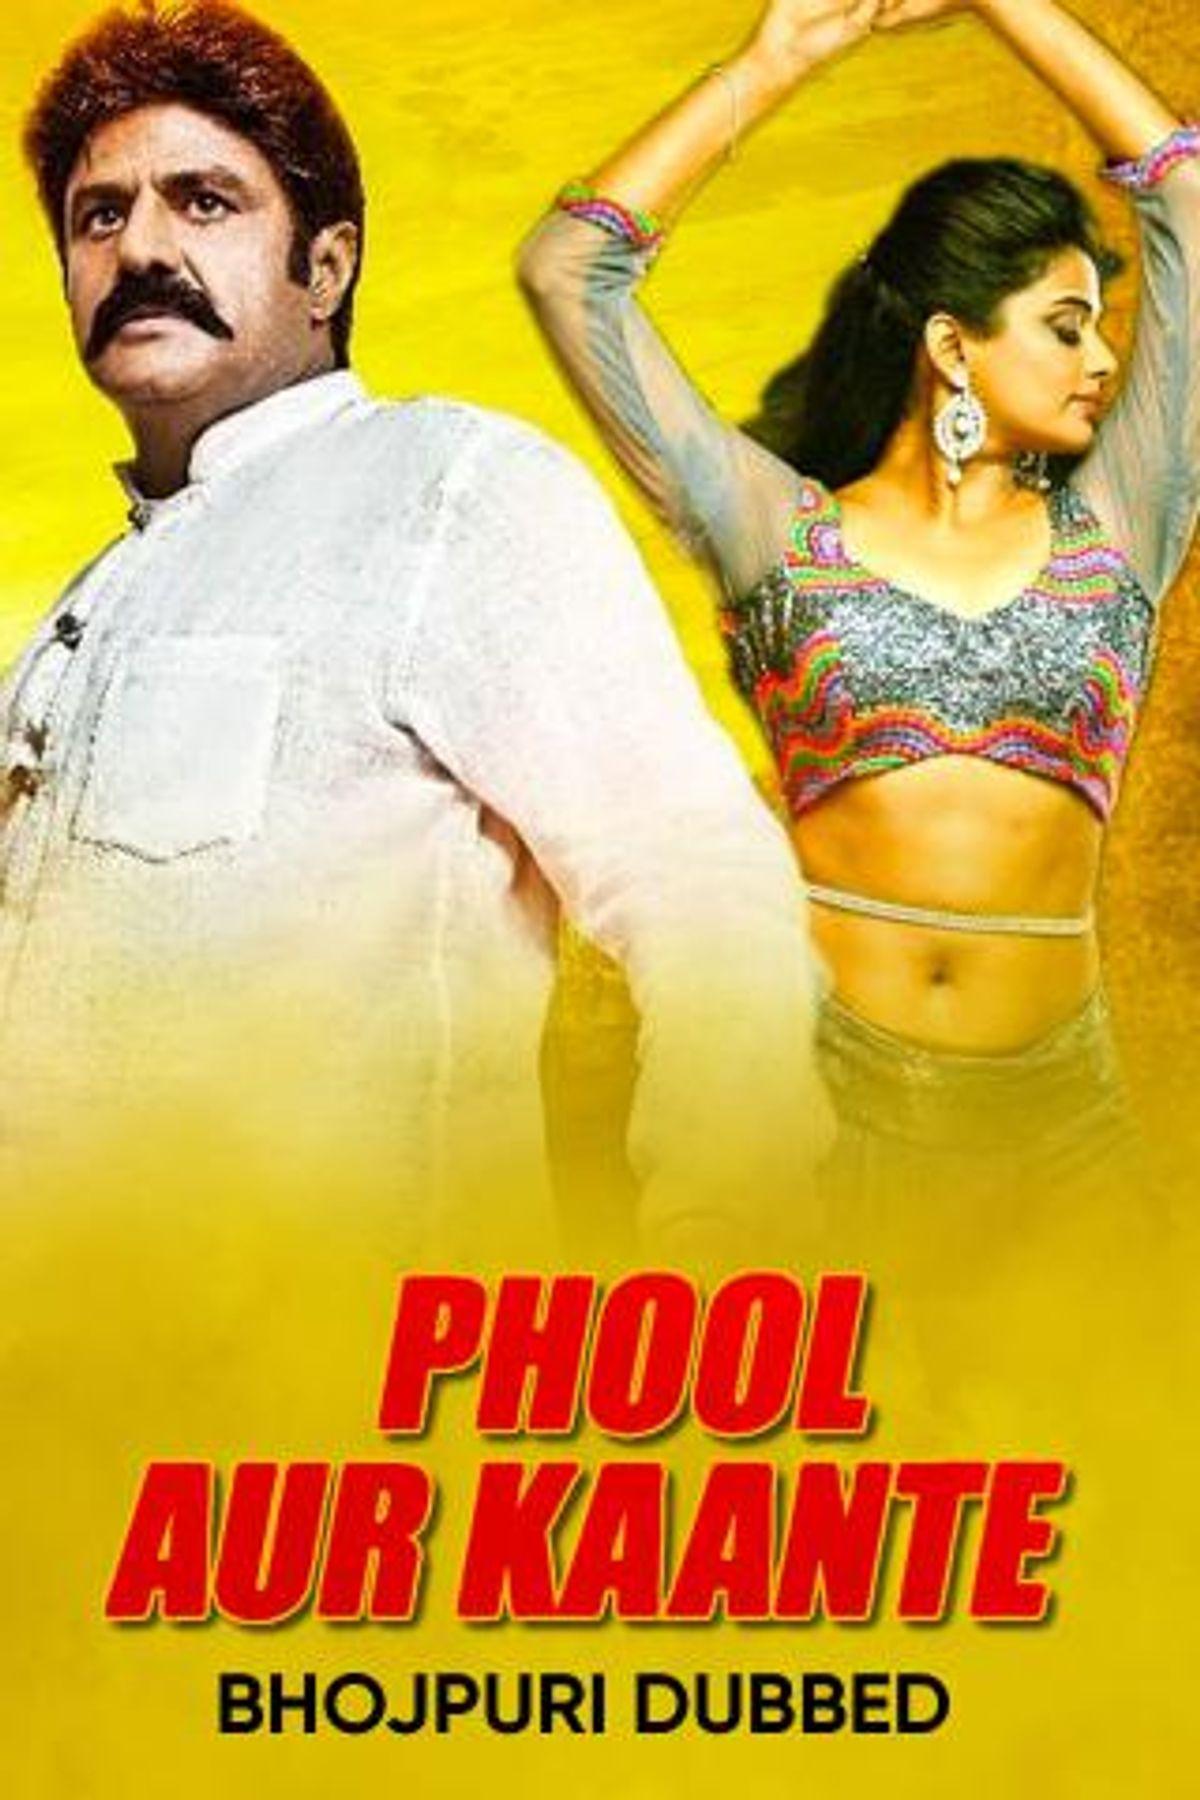 Best Dubbed movies in Bhojpuri